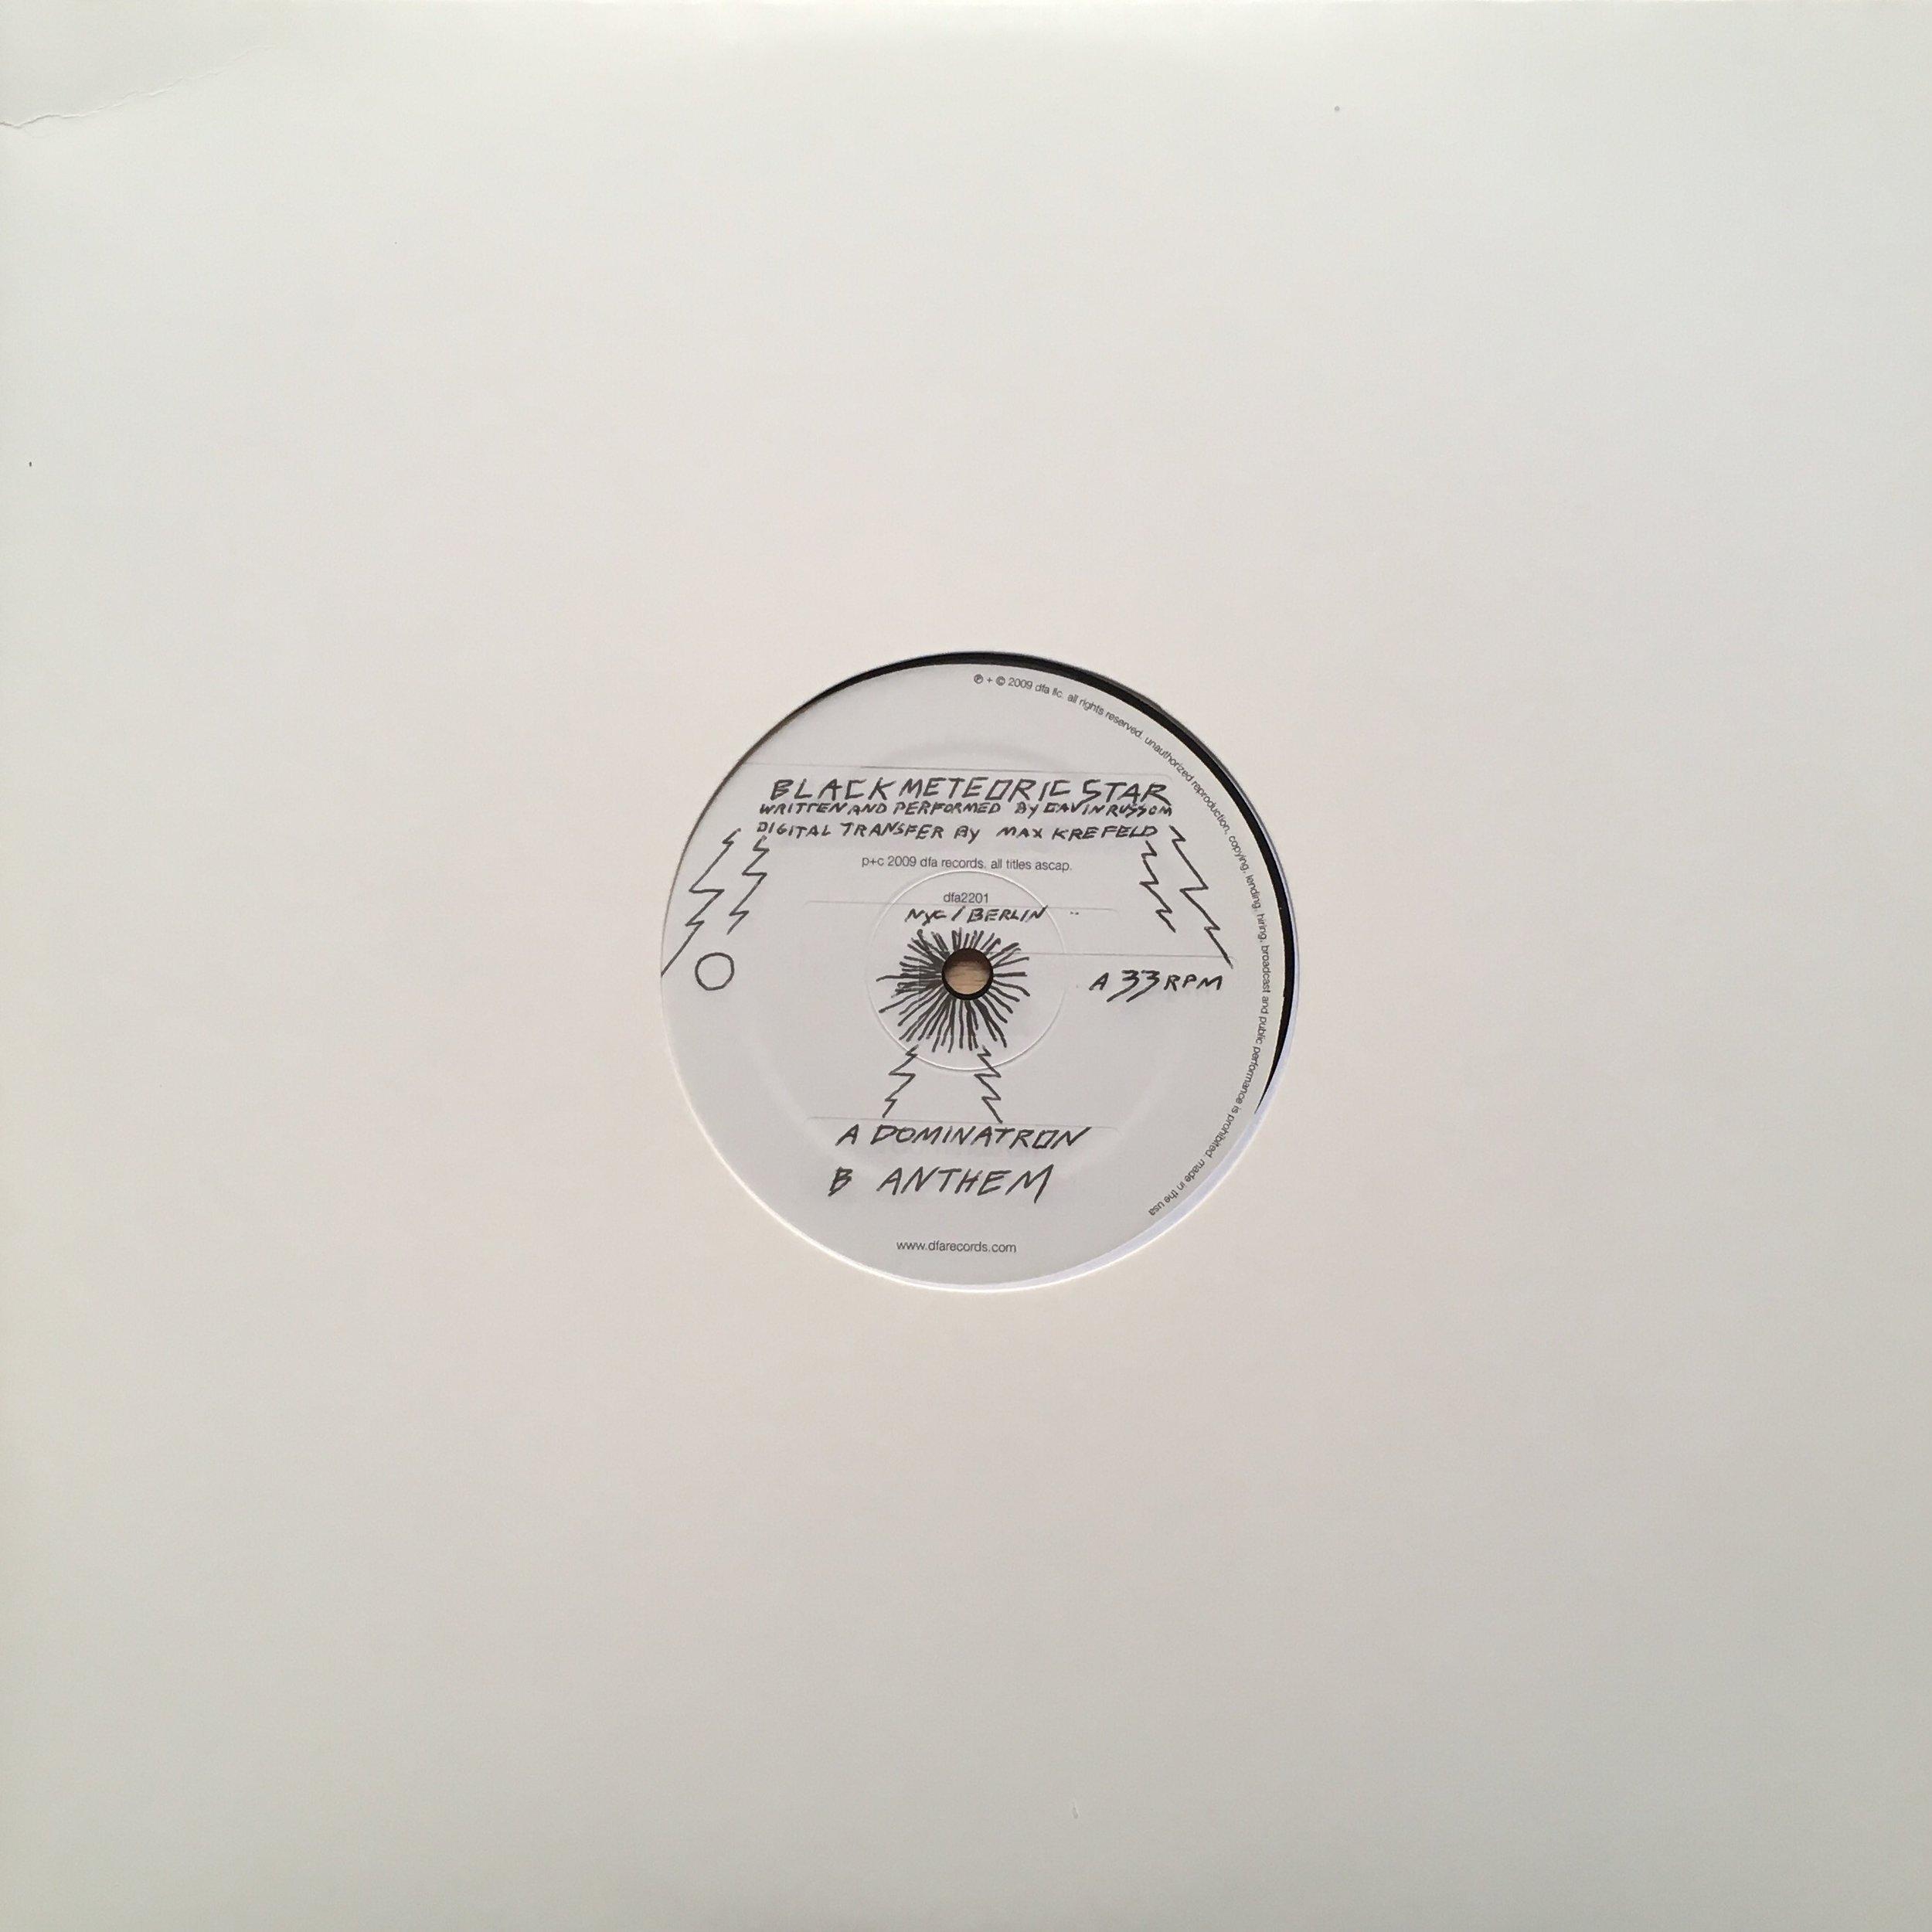 Dominatron/Anthem